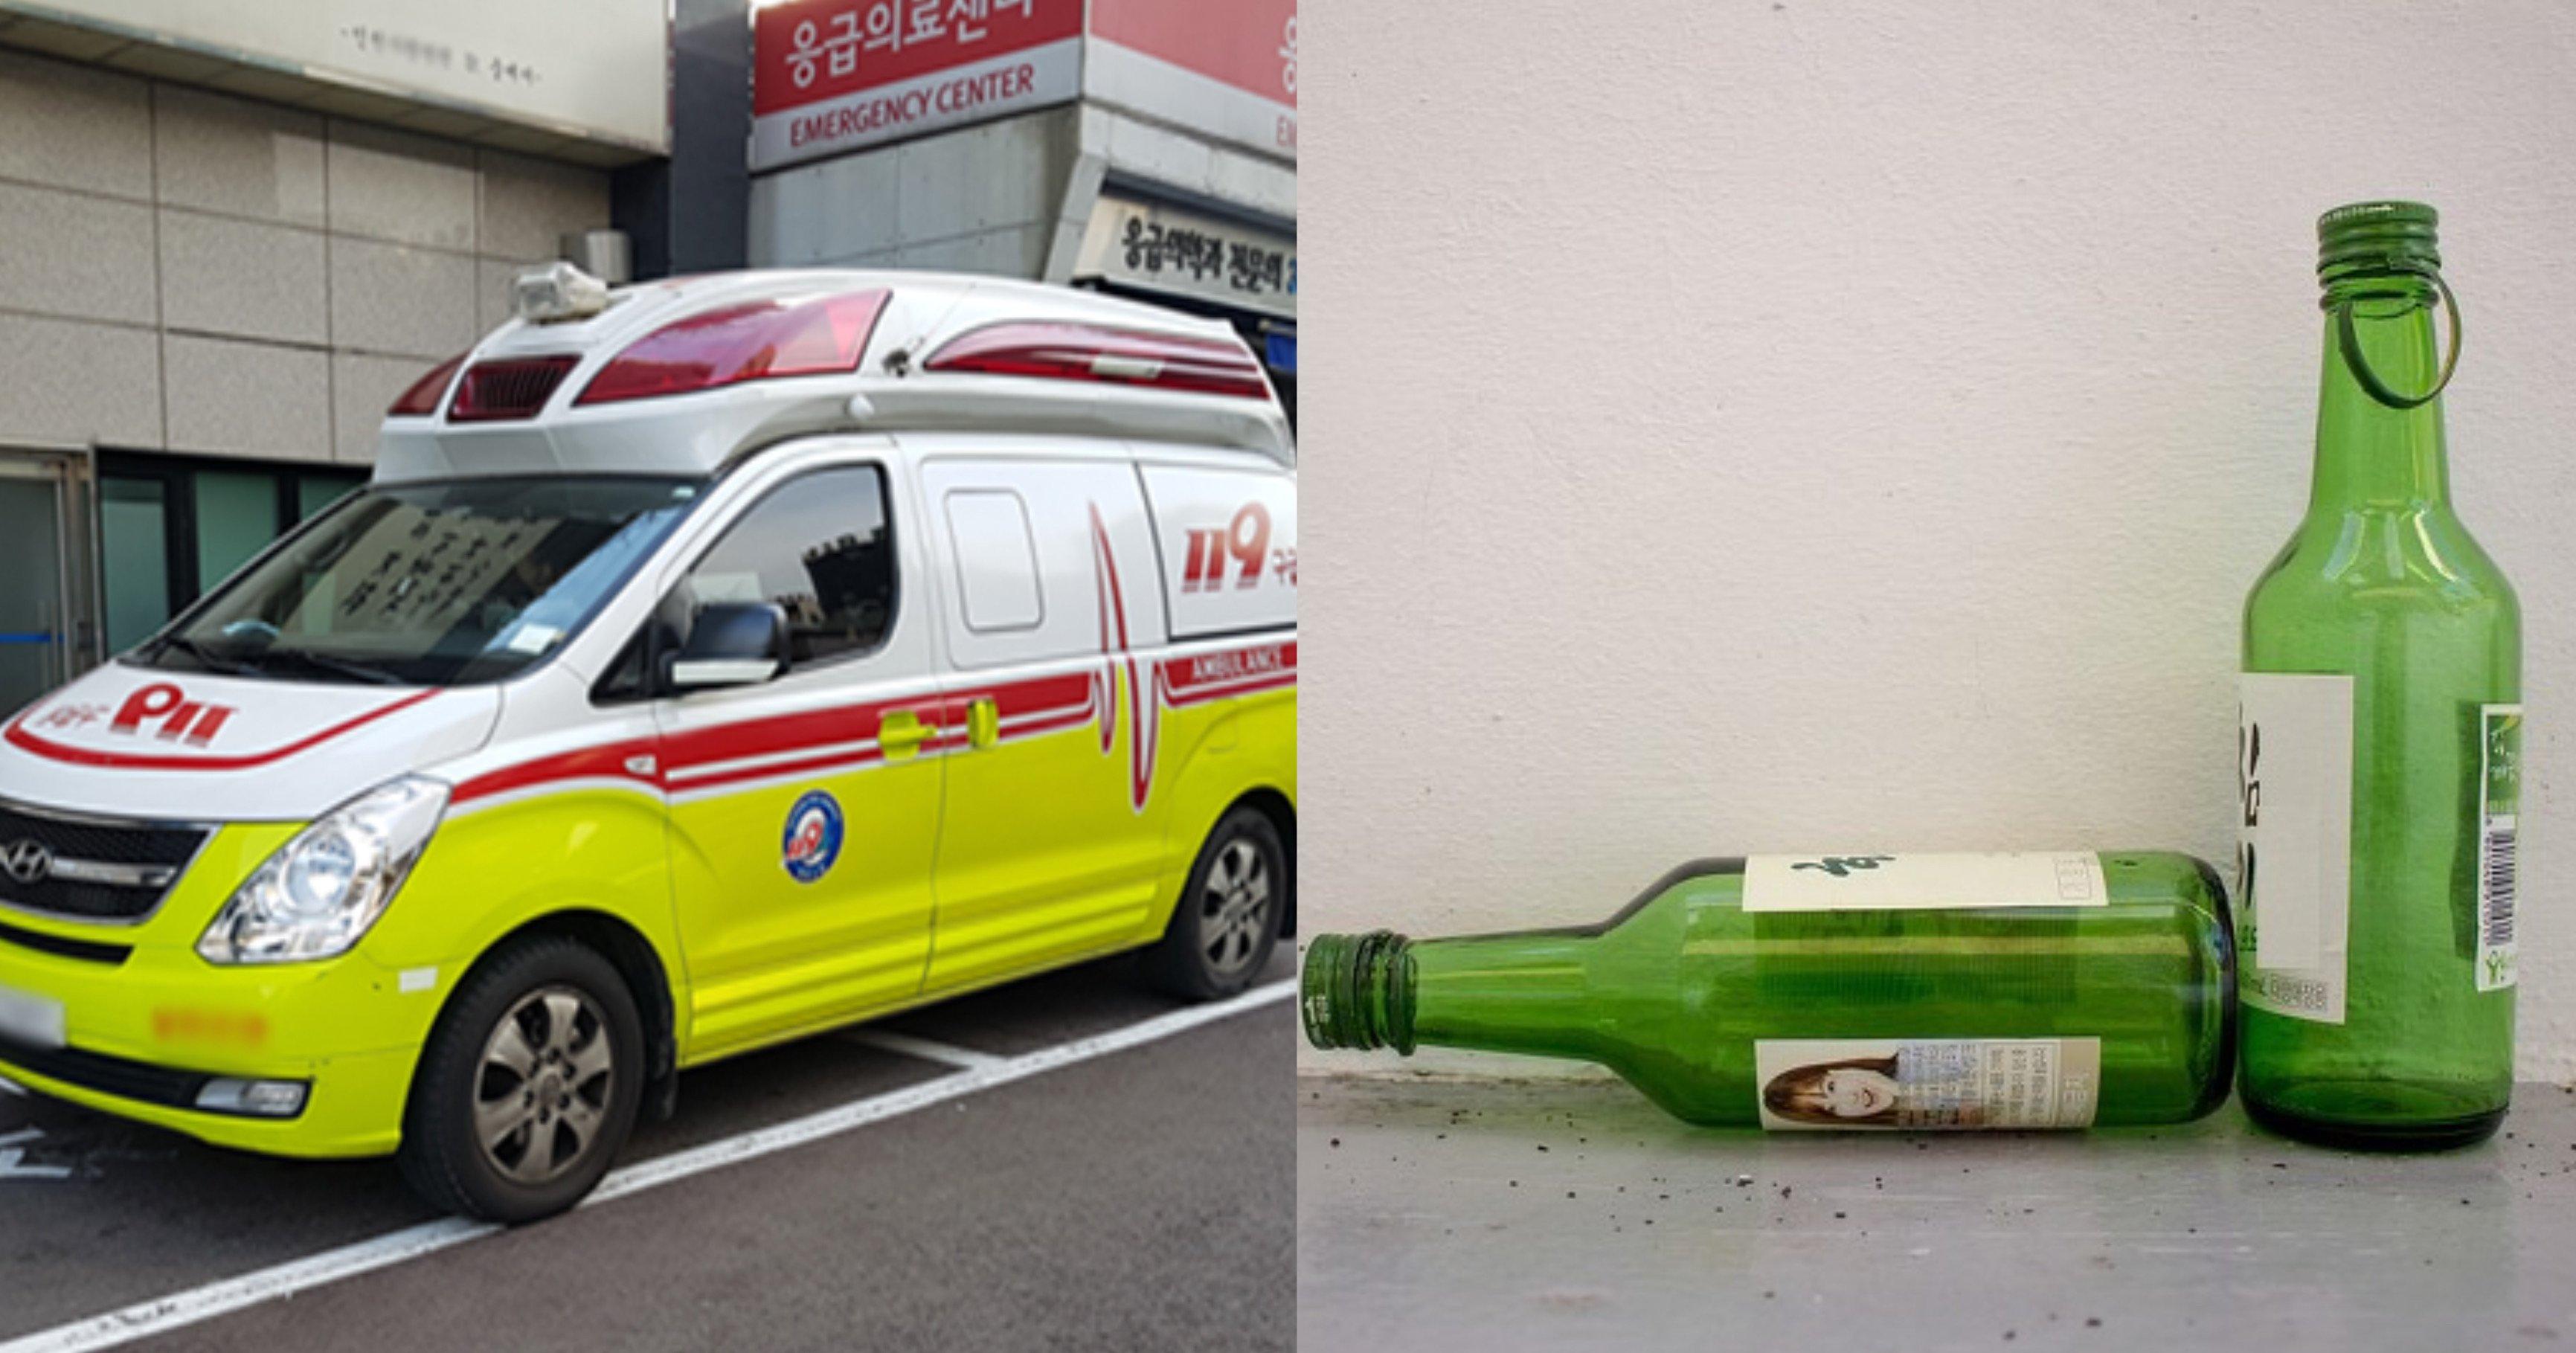 "ec868ceca3bcebb391 ec8db8eb84a4ec9dbc.jpg?resize=1200,630 - ""술마신것 들키면 안되서...""...12층에서 '달리는 구급차'에 '소주병' 던져버린 남성"